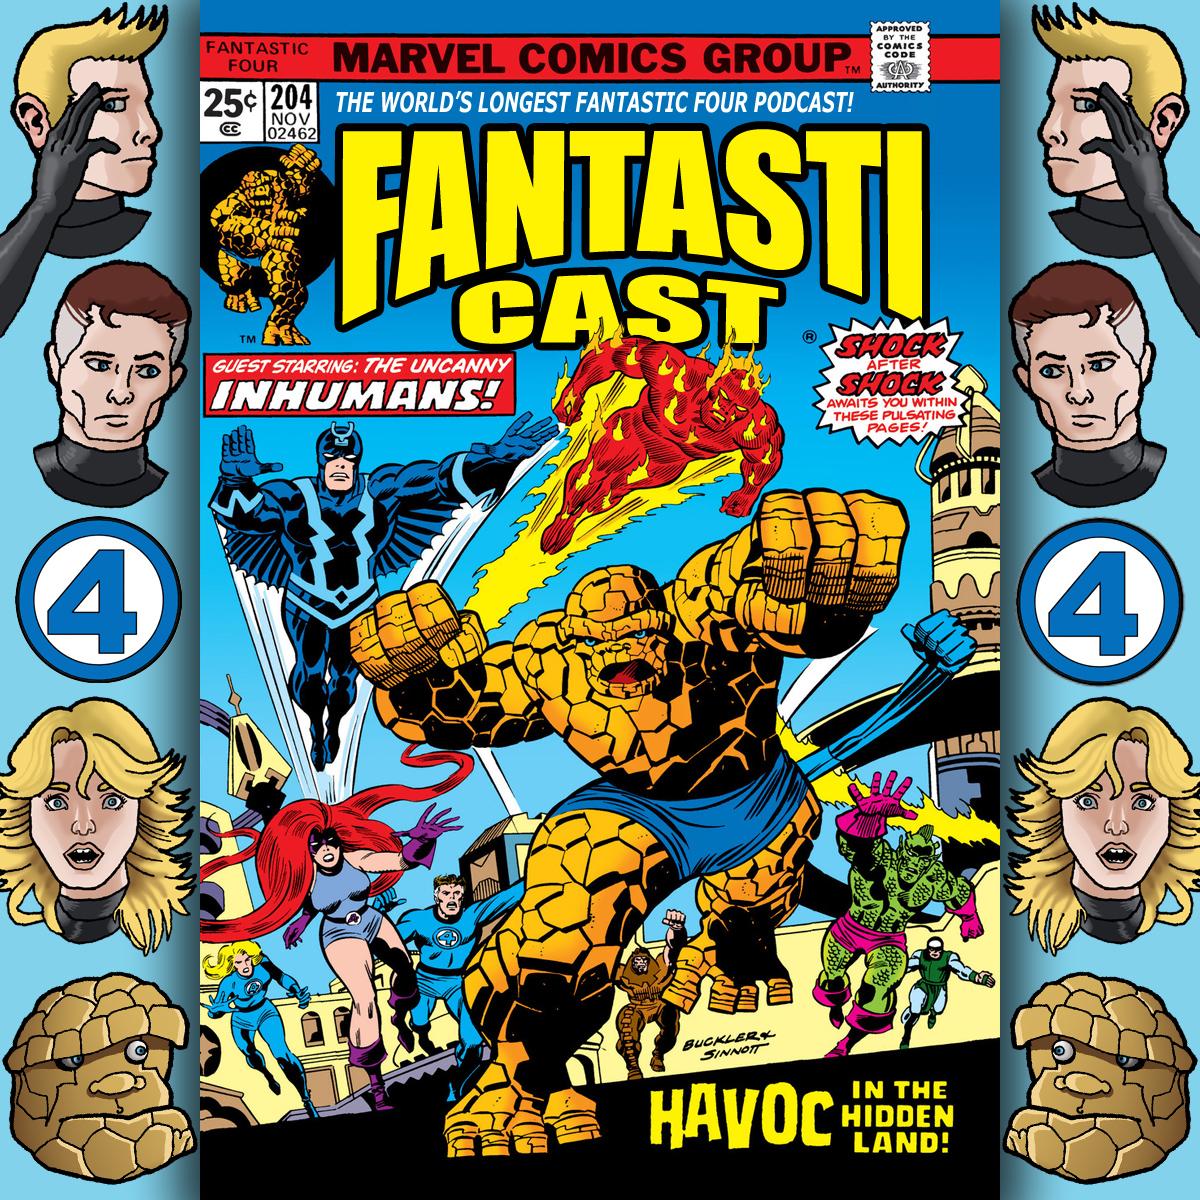 Episode 204: Fantastic Four #159 - Havoc in the Hidden Land